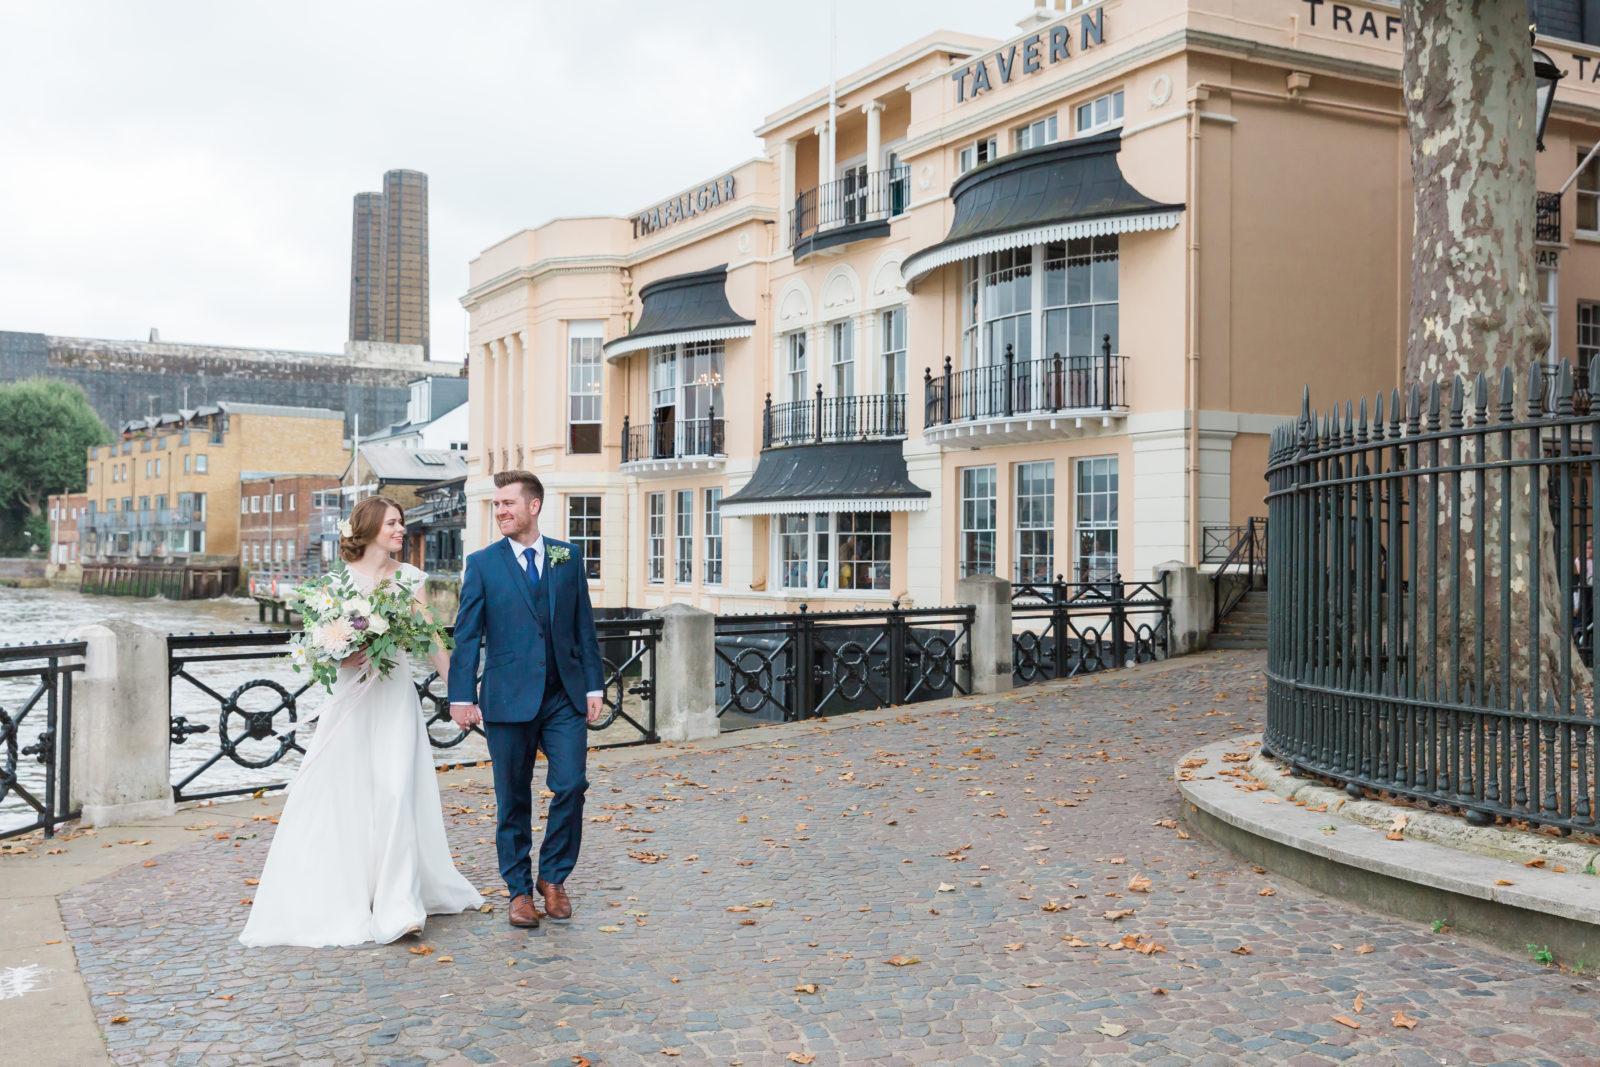 romantic-wedding-day-London.jpg